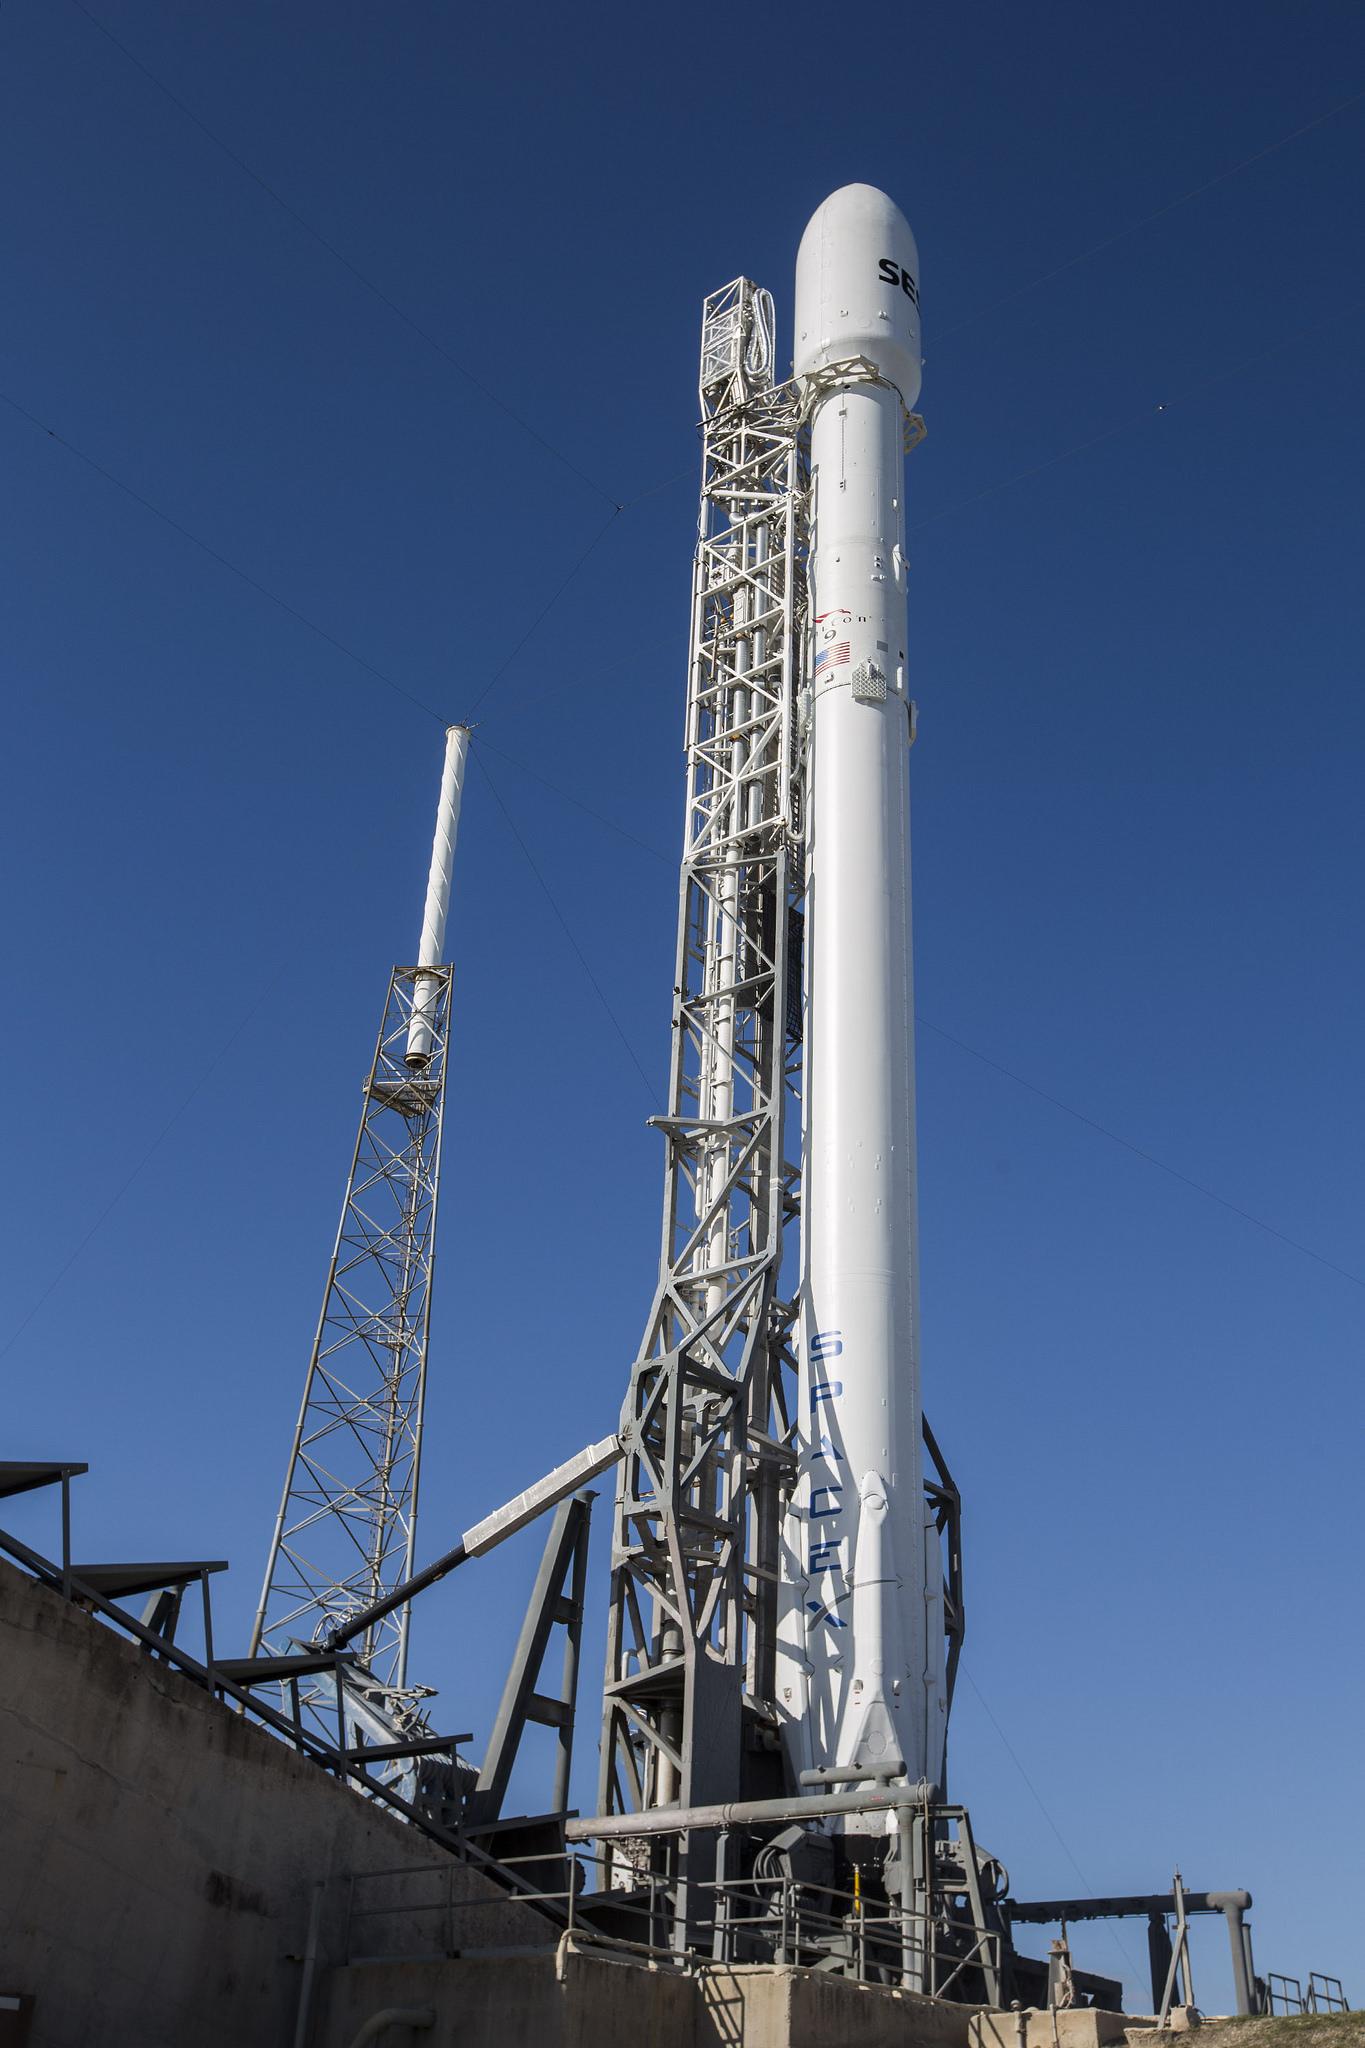 SES-9 Satellite, Falcon 9 Rocket on the Pad